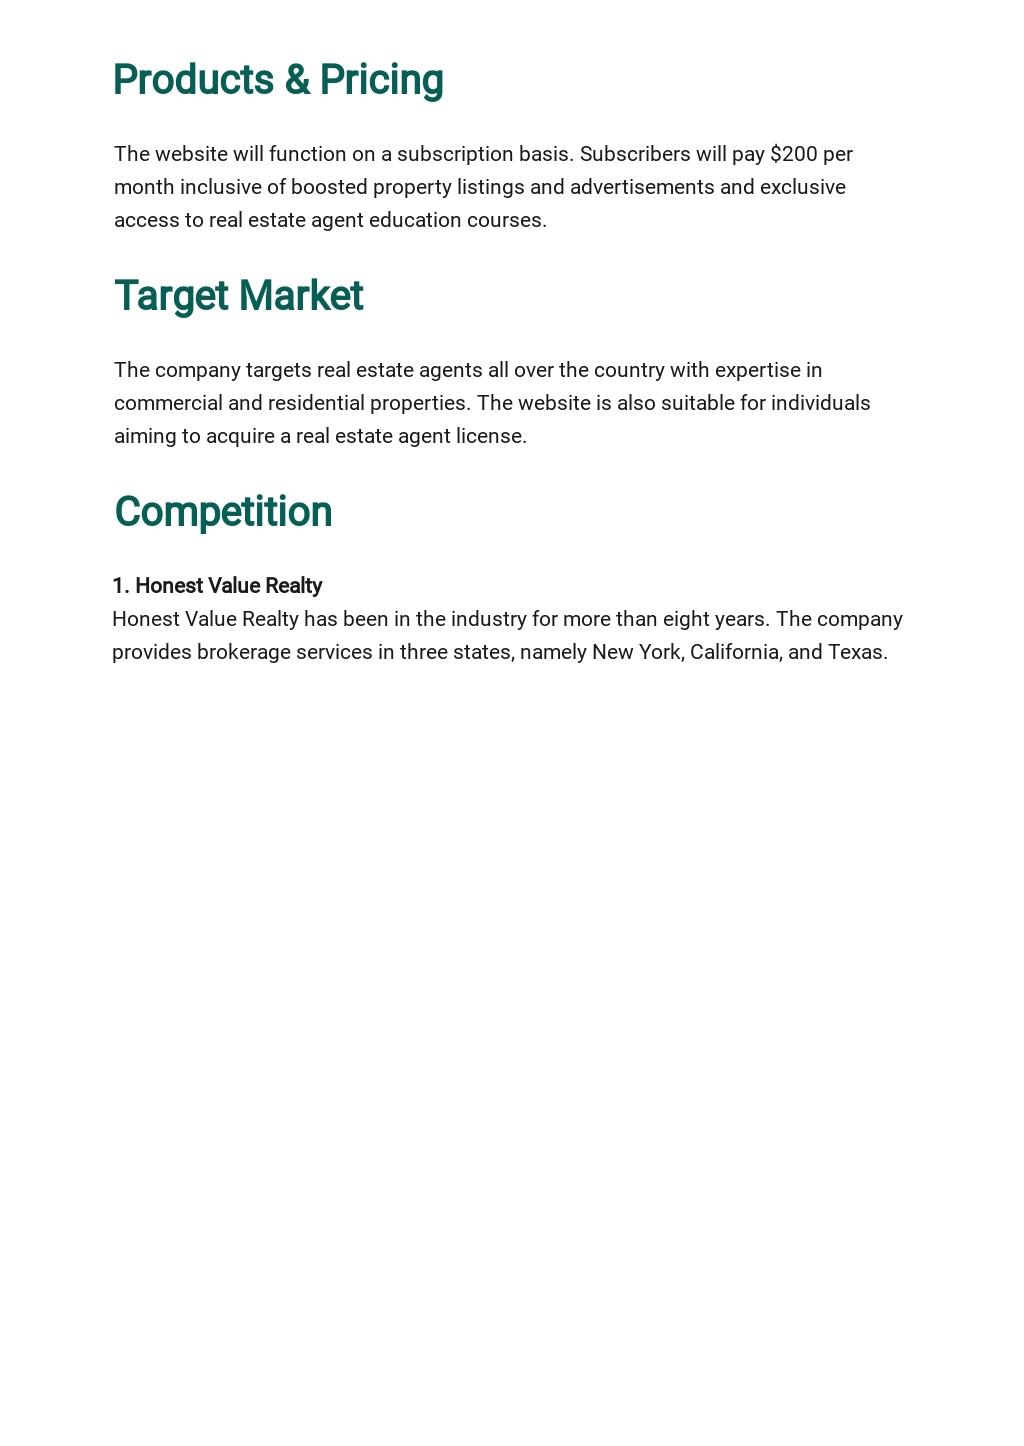 Real Estate Website Business Plan Template 2.jpe